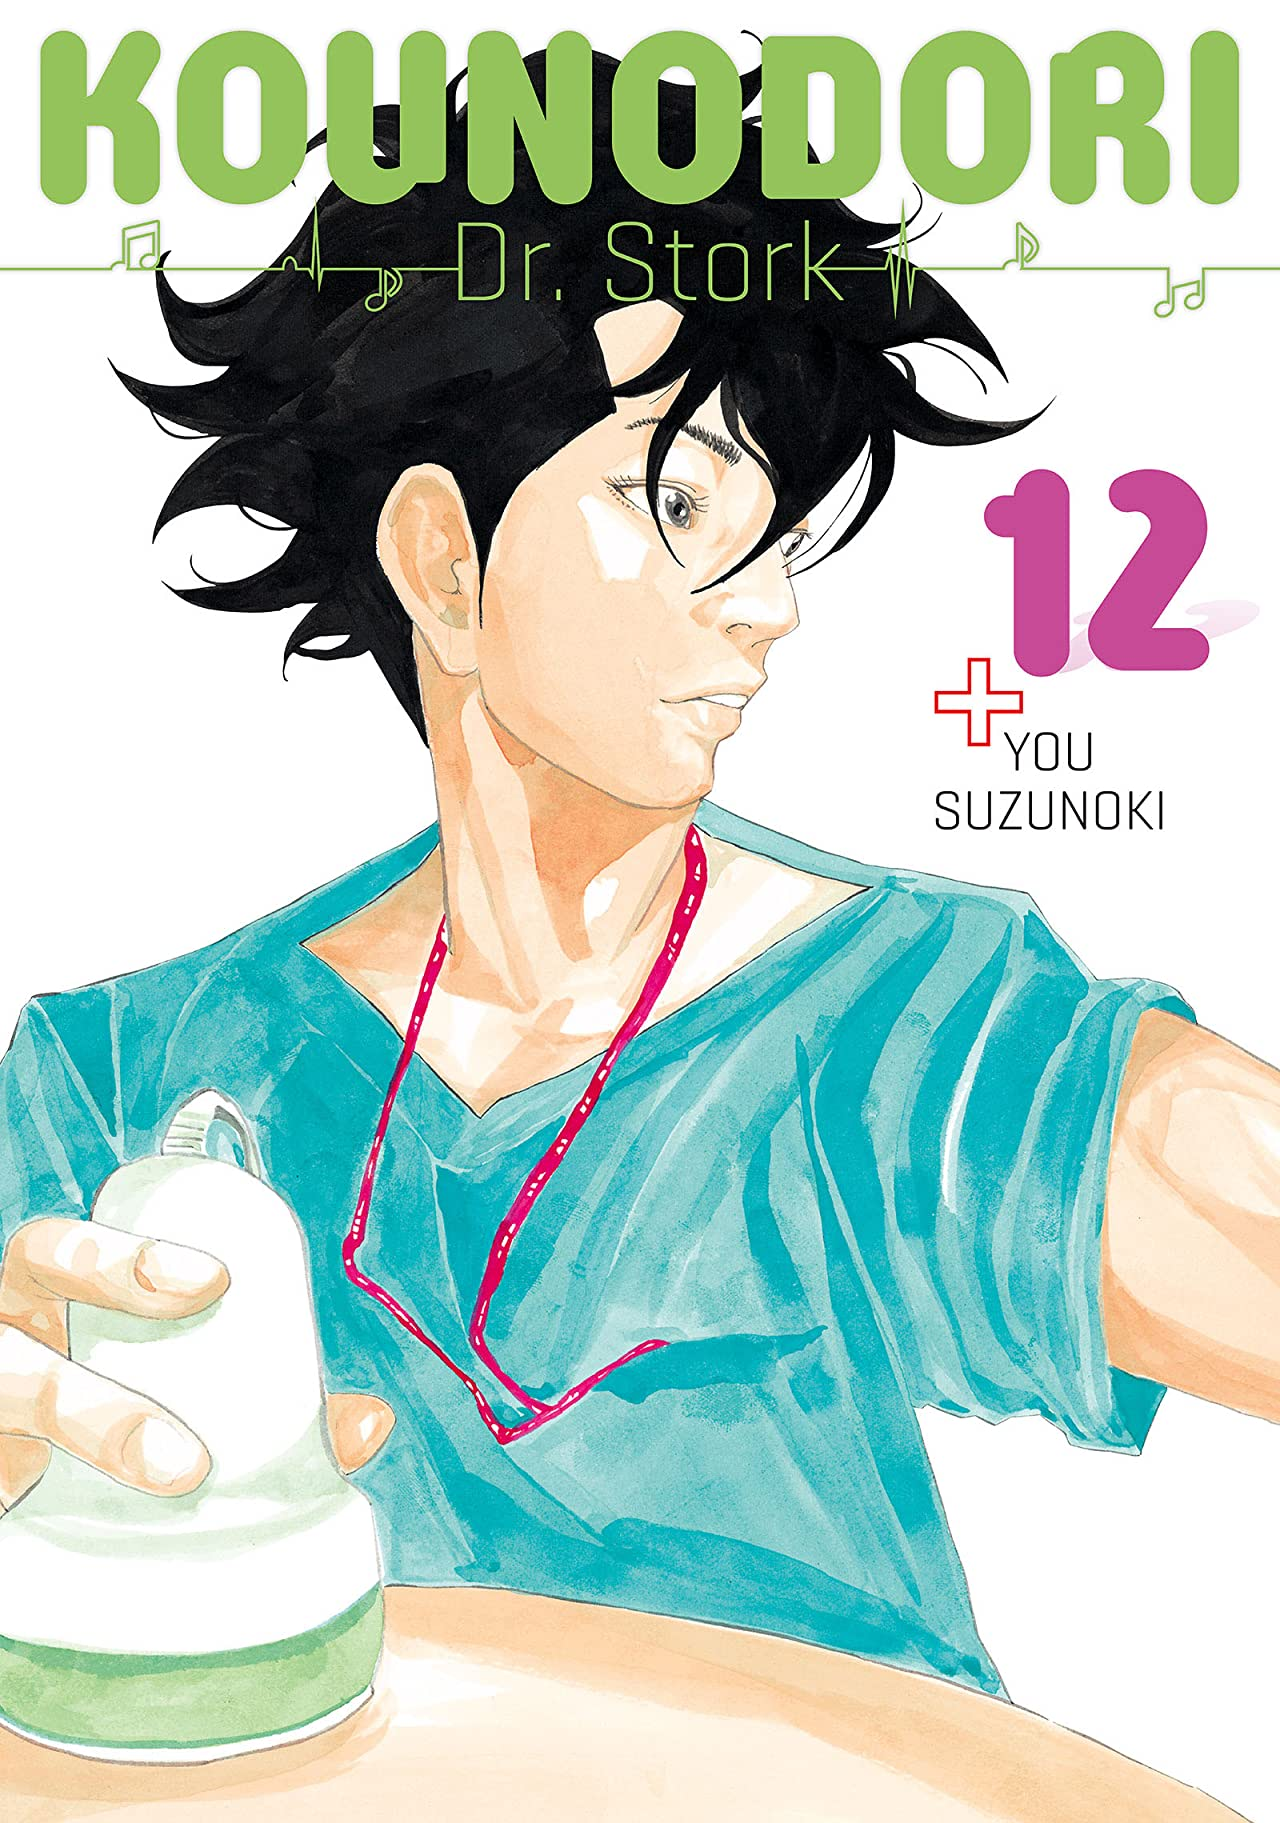 Kounodori: Dr. Stork Vol. 12